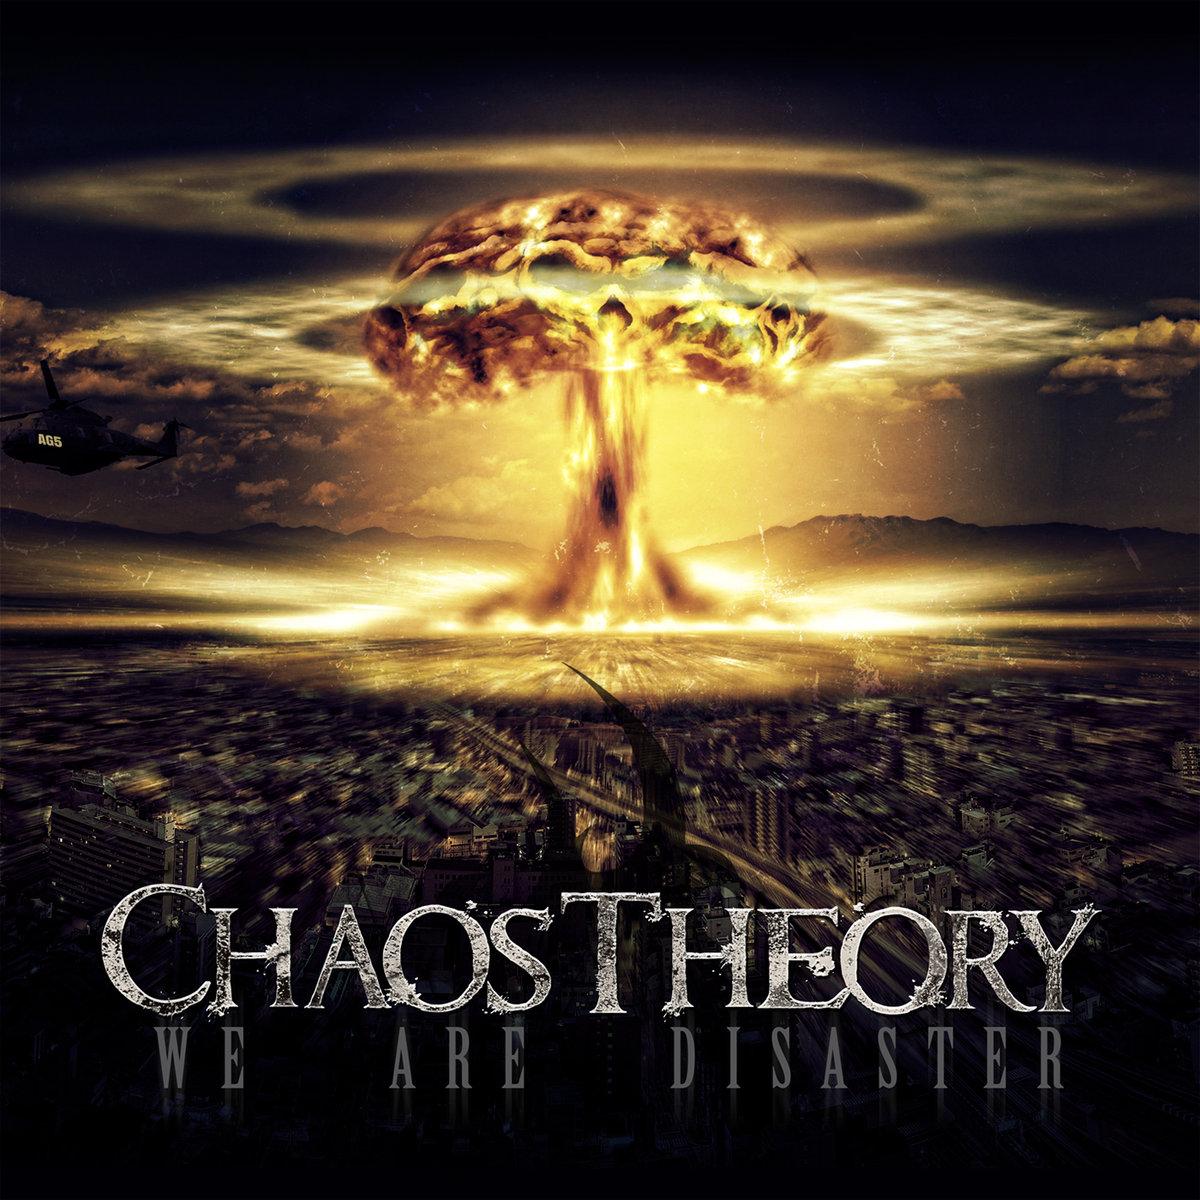 chaostheory_wearedisaster.jpg